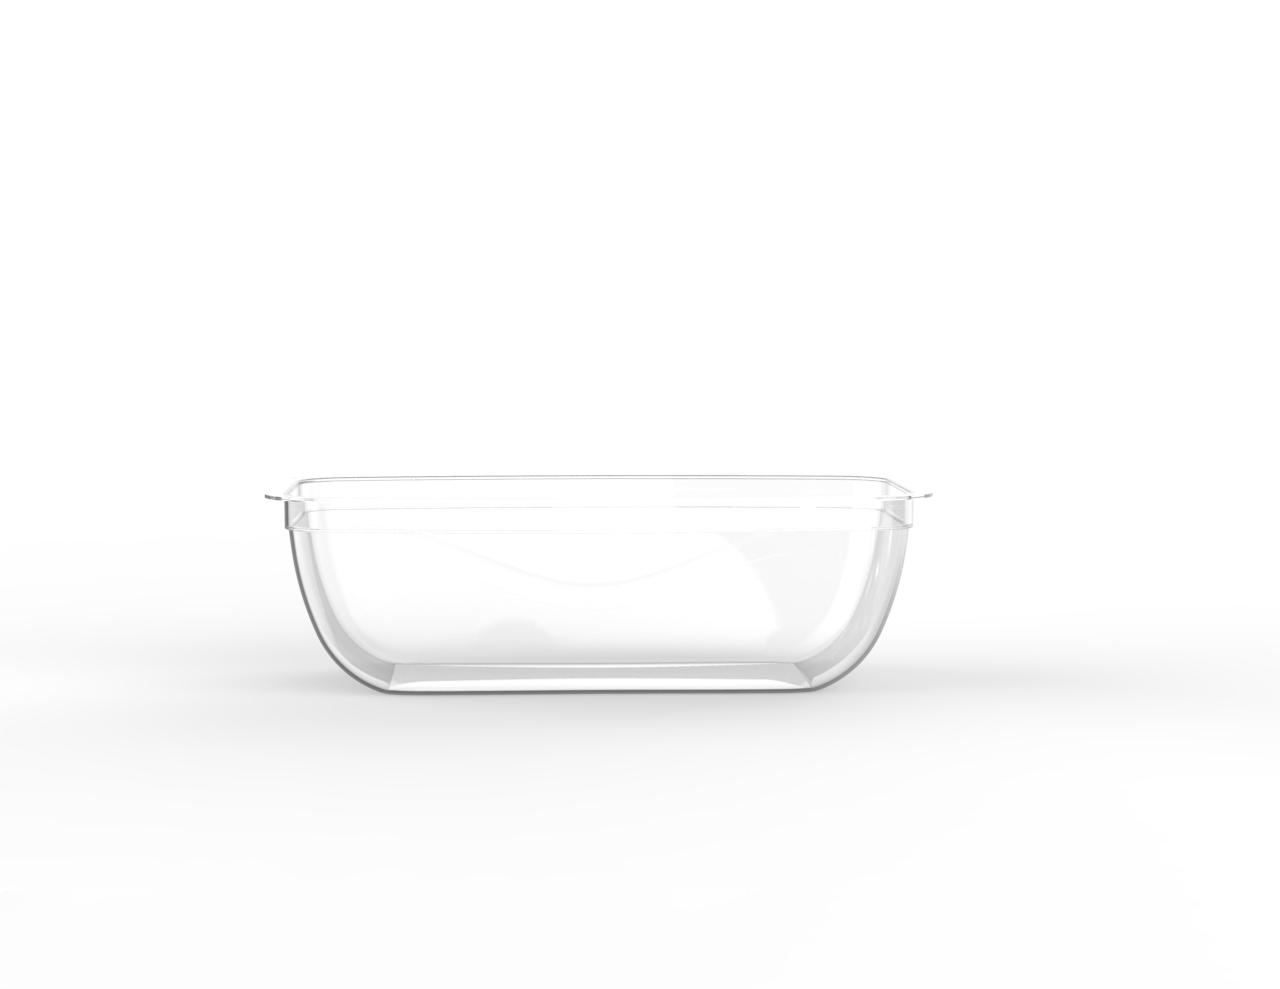 Barquette tartinable operculable transparente 250 cm3